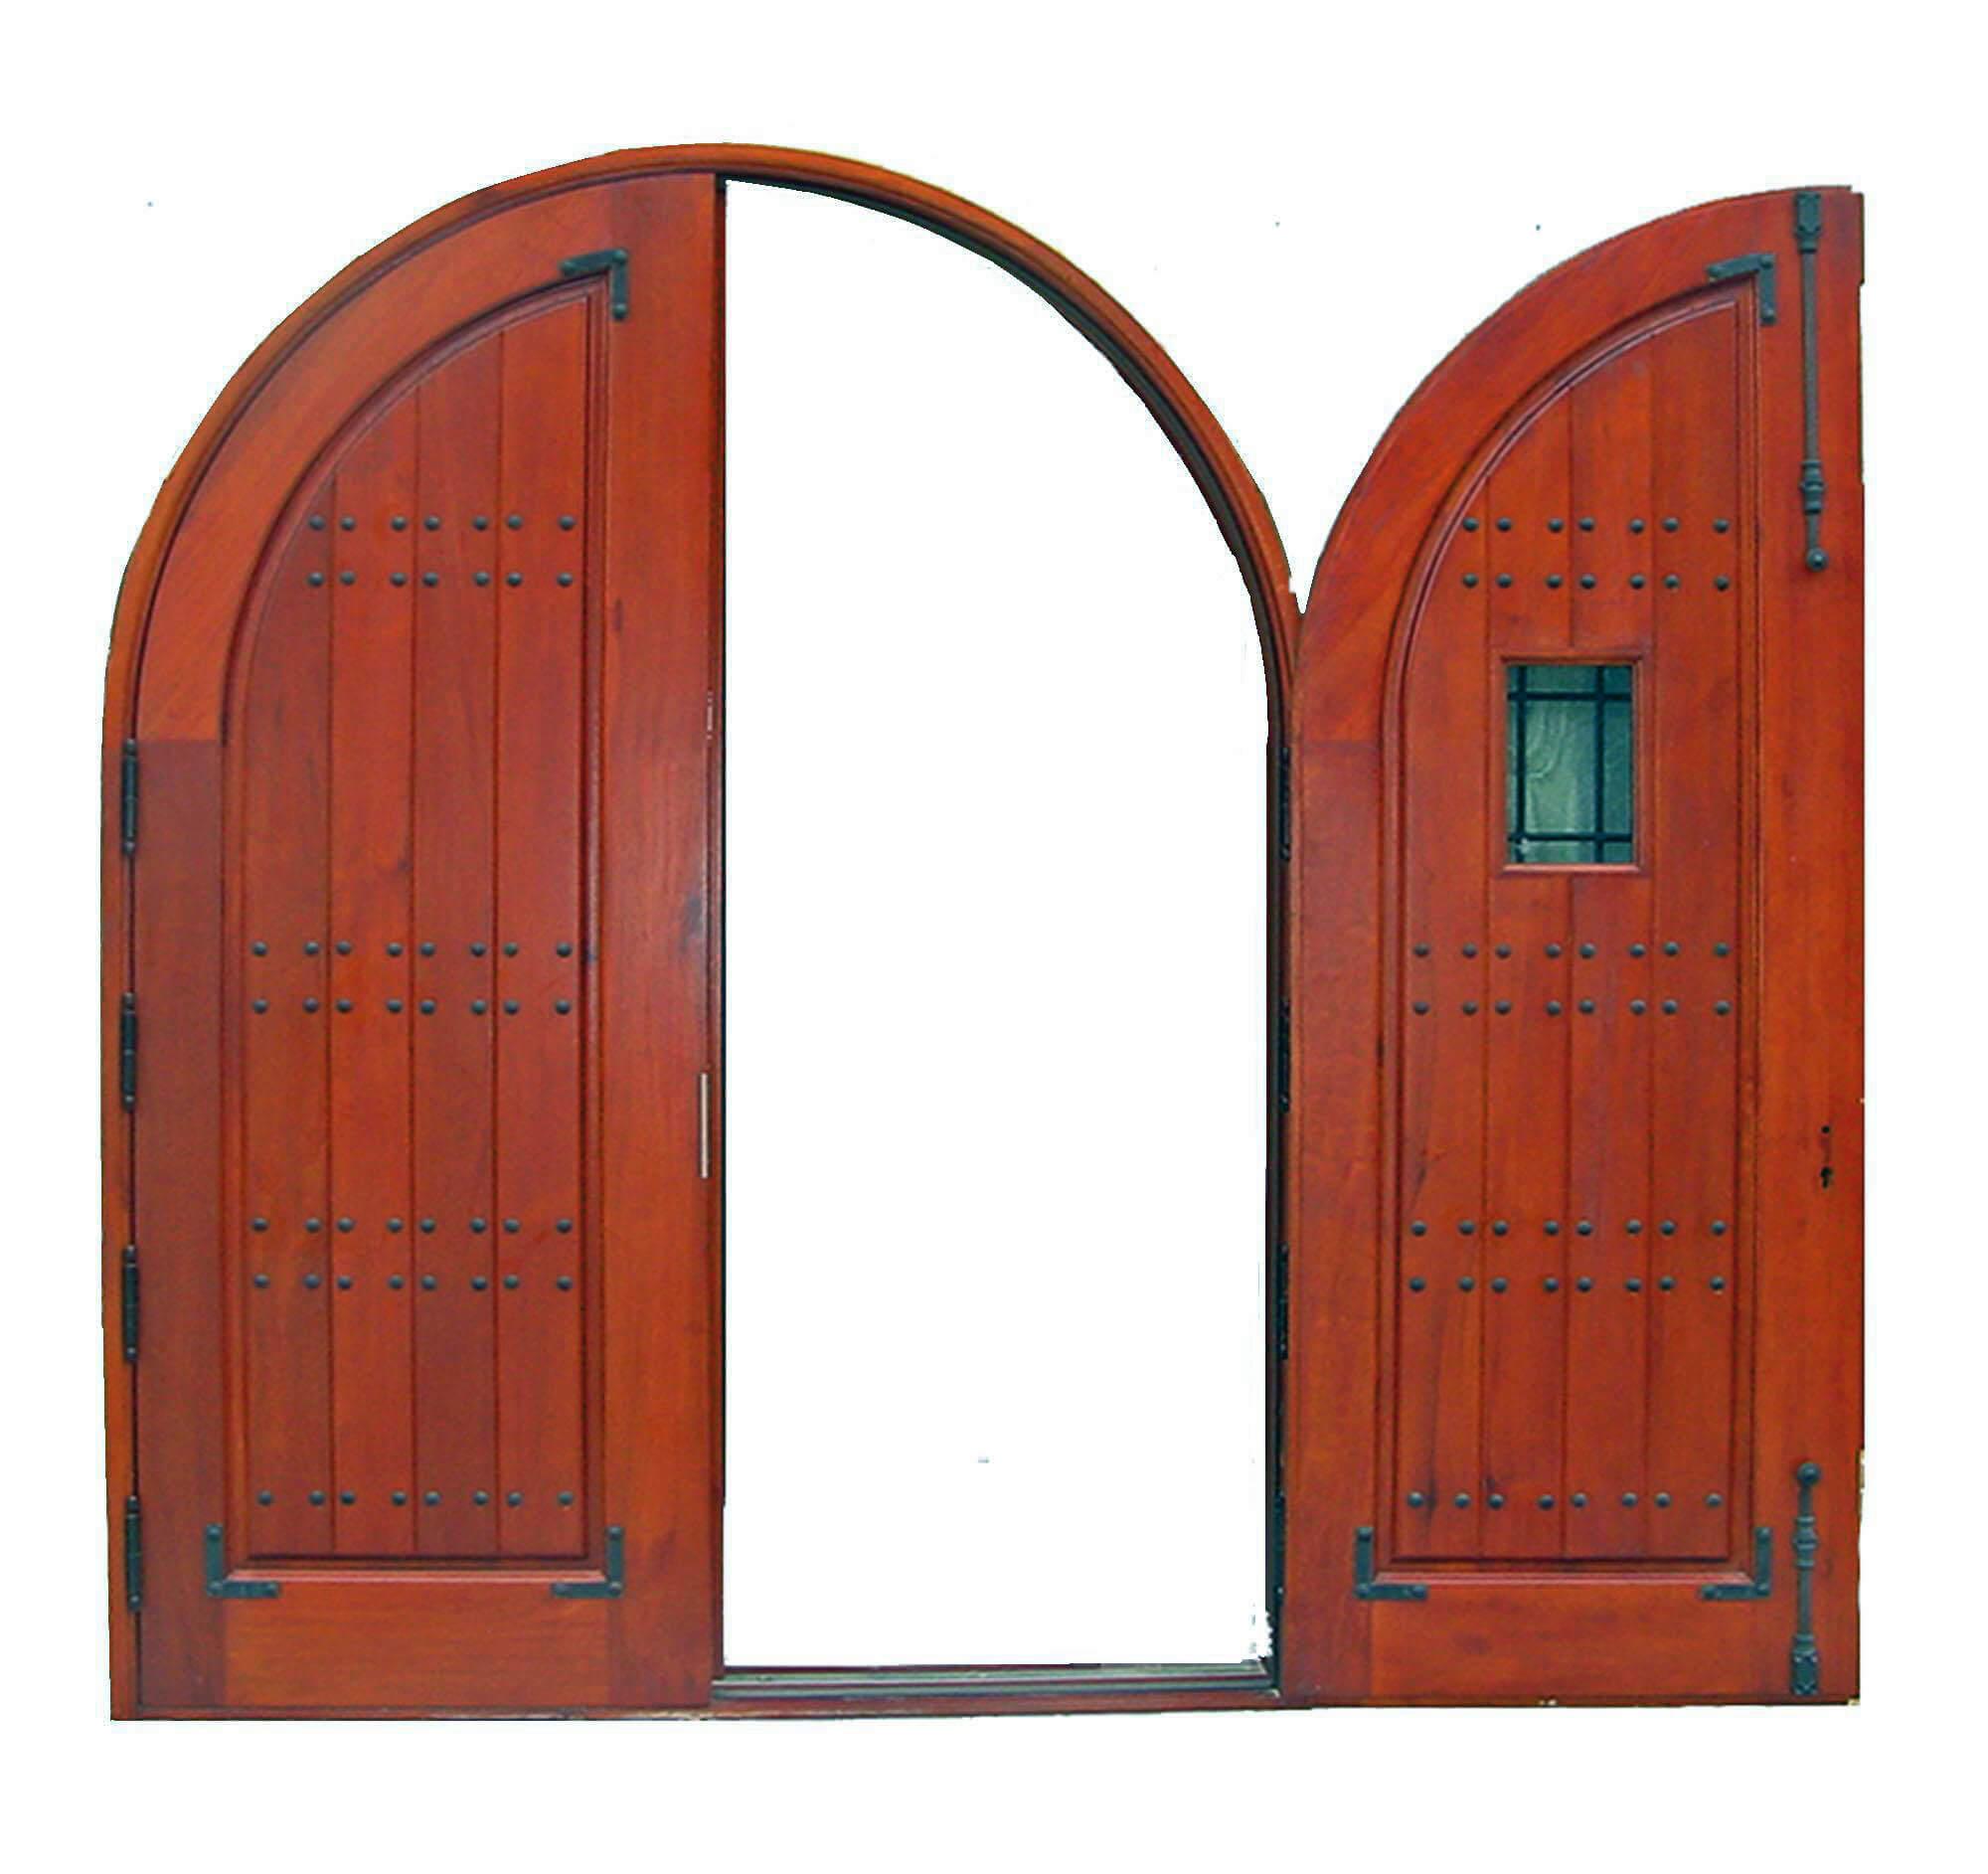 MERRIT ISLAND MAHOGANY ENTRY DOOR.